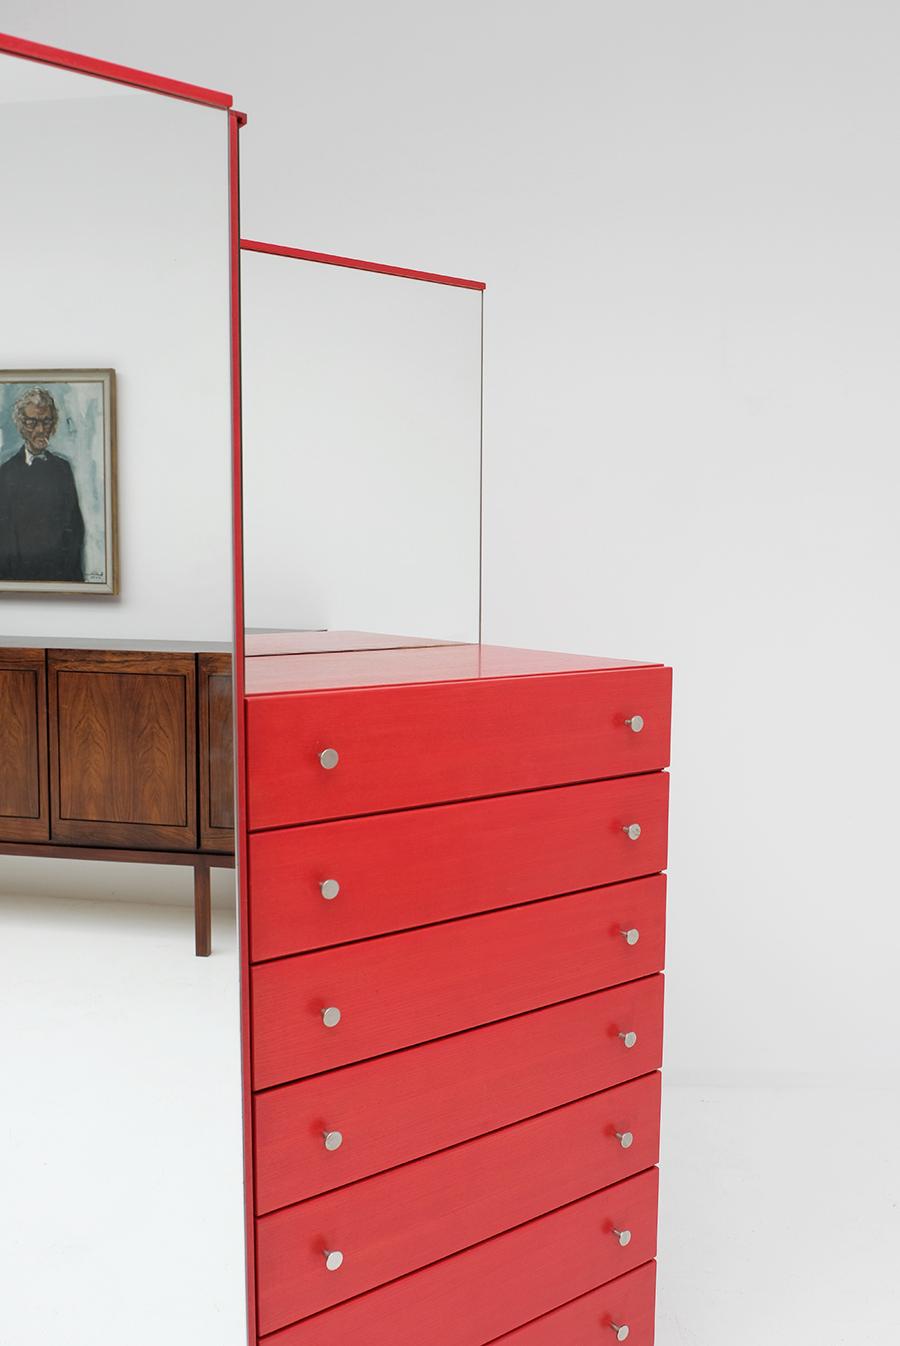 Red Commode Dresser Mirrorimage 4